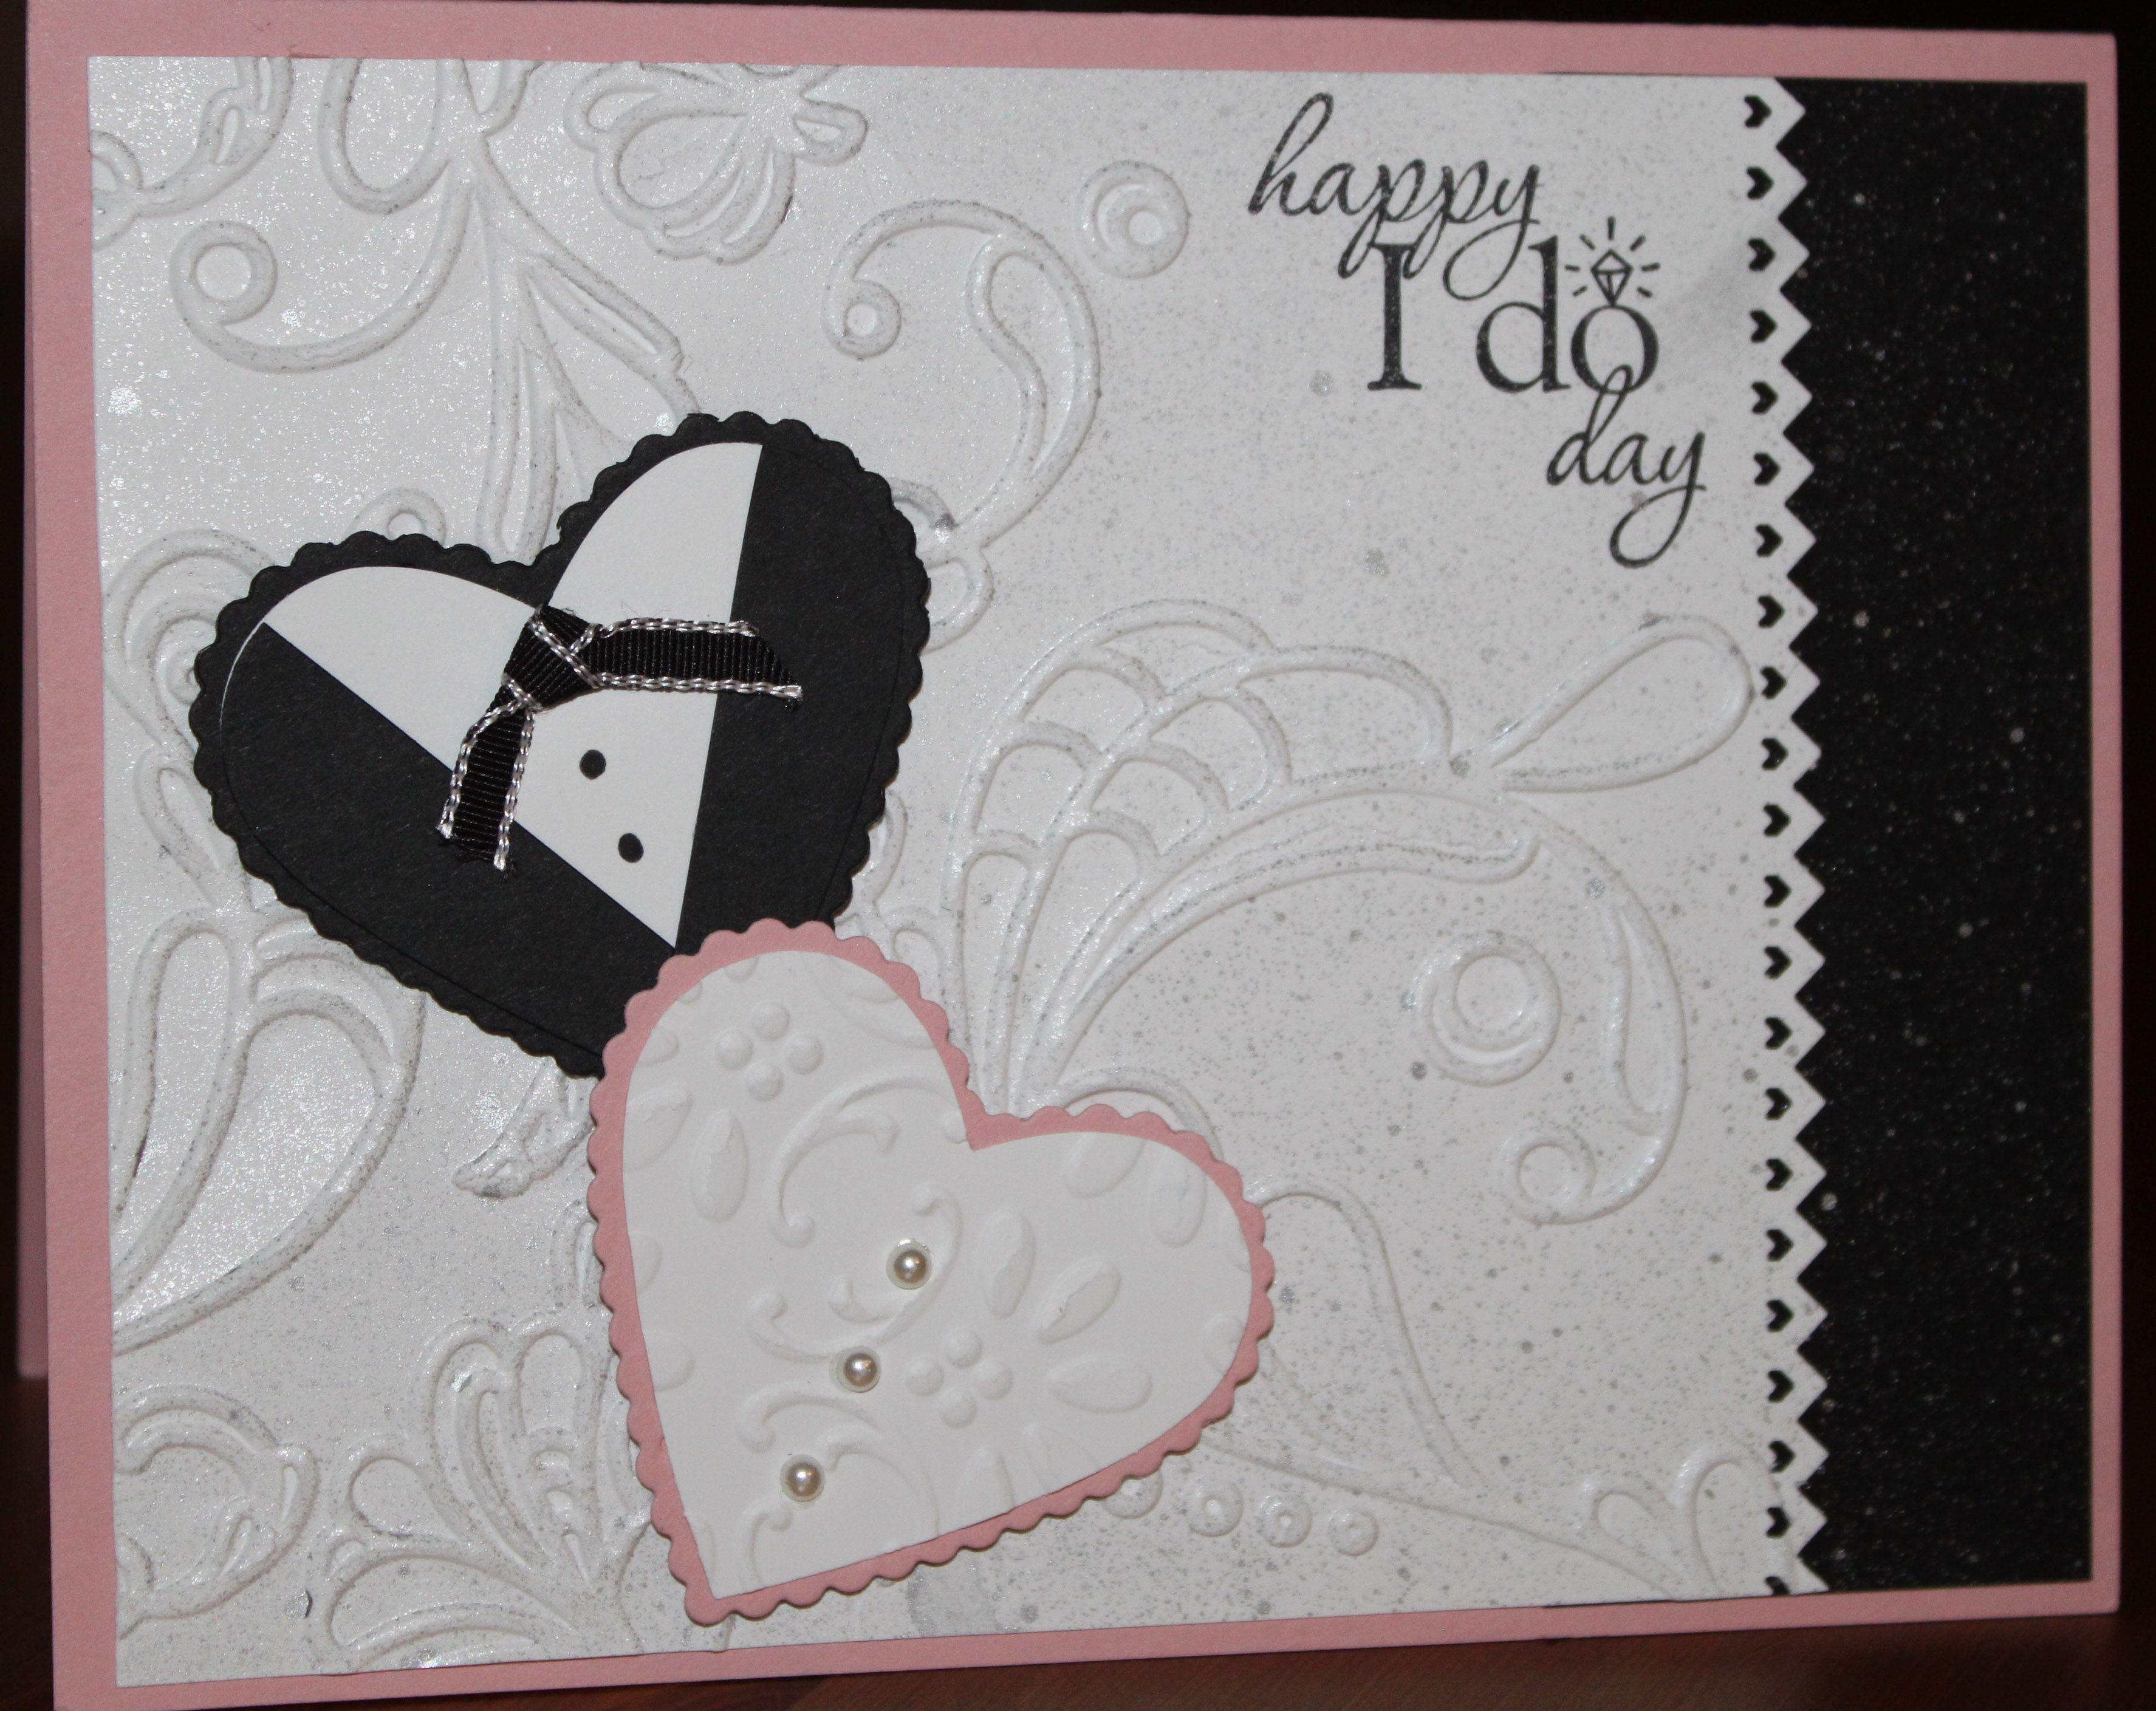 Stampin Up Wedding Invitations: Stampin Up Wedding Invitation Designs